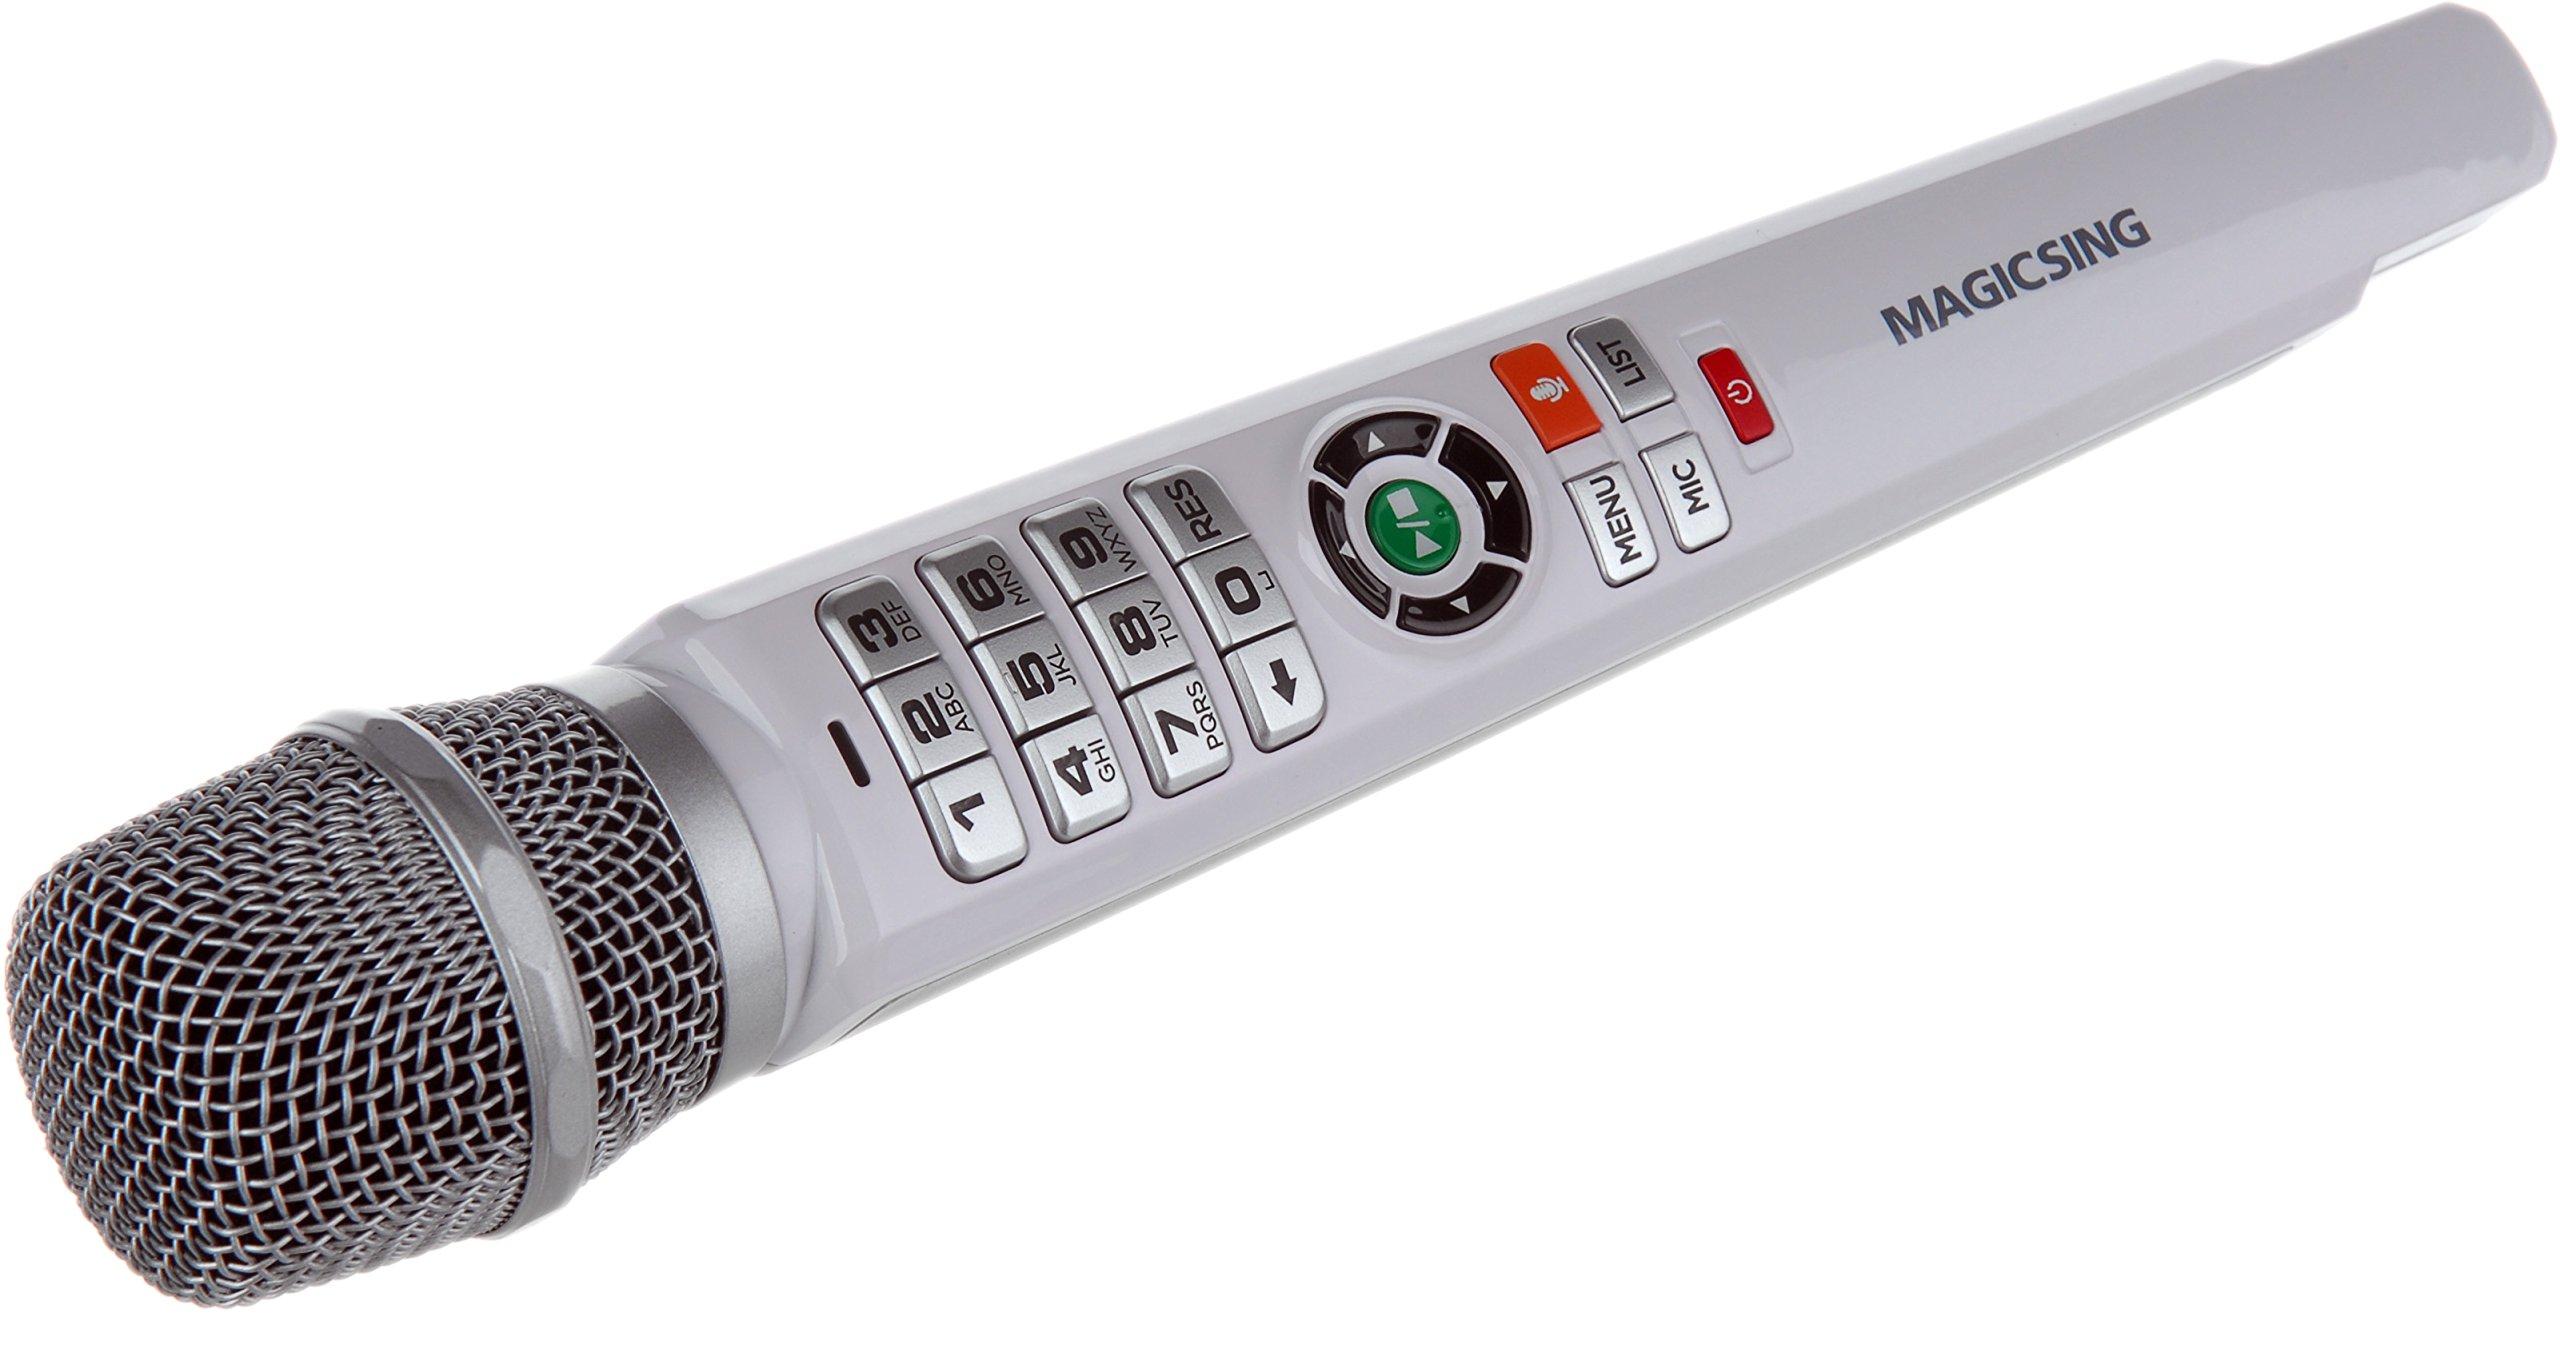 Magic Sing EB2 · Additional Wireless Microphone for the Magic Sing E2 Karaoke Machine